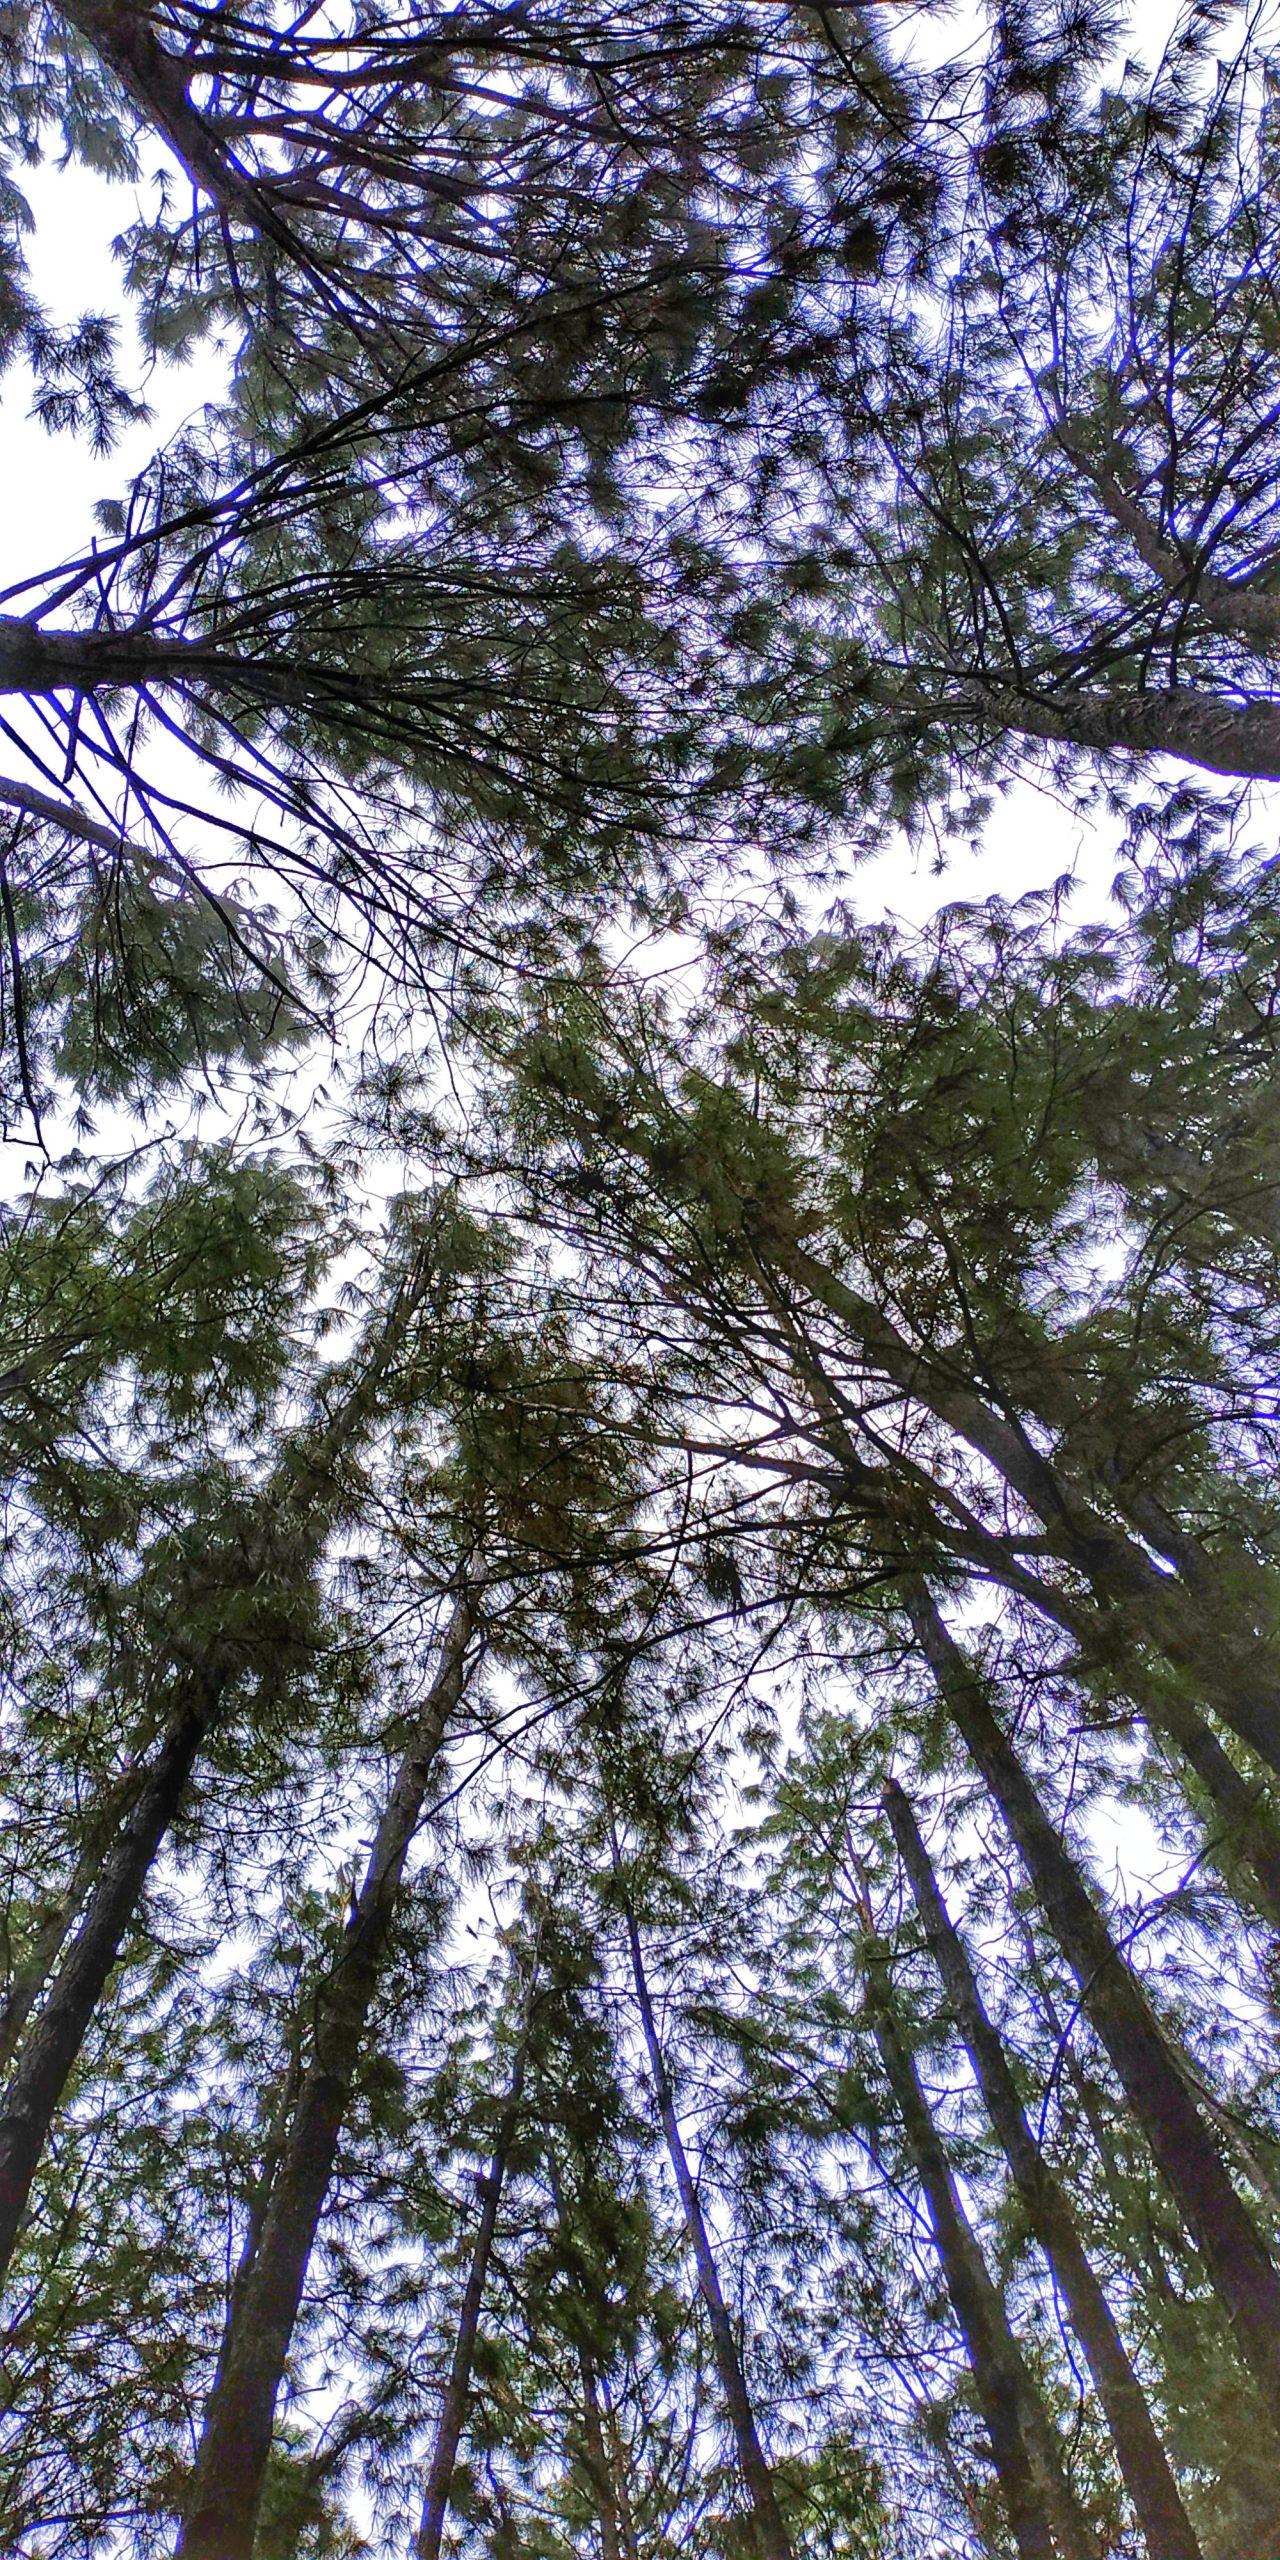 Pine trees jungle